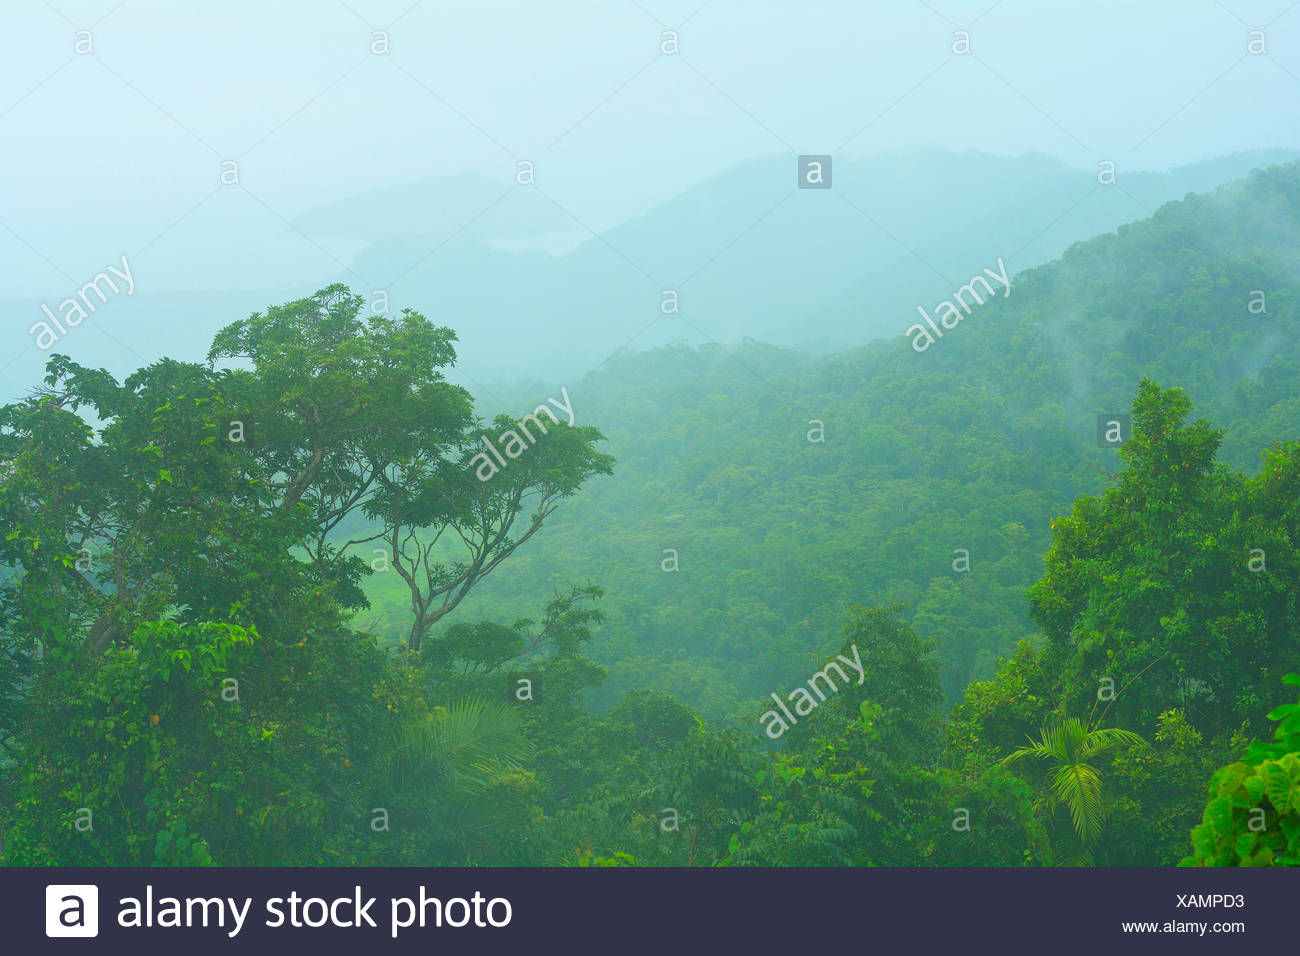 Landschaft entlang der Cape Tribulation Road, Daintree Regenwald, Australien, Queensland, Kimberley | Landscape at Cape Tribulat Stock Photo